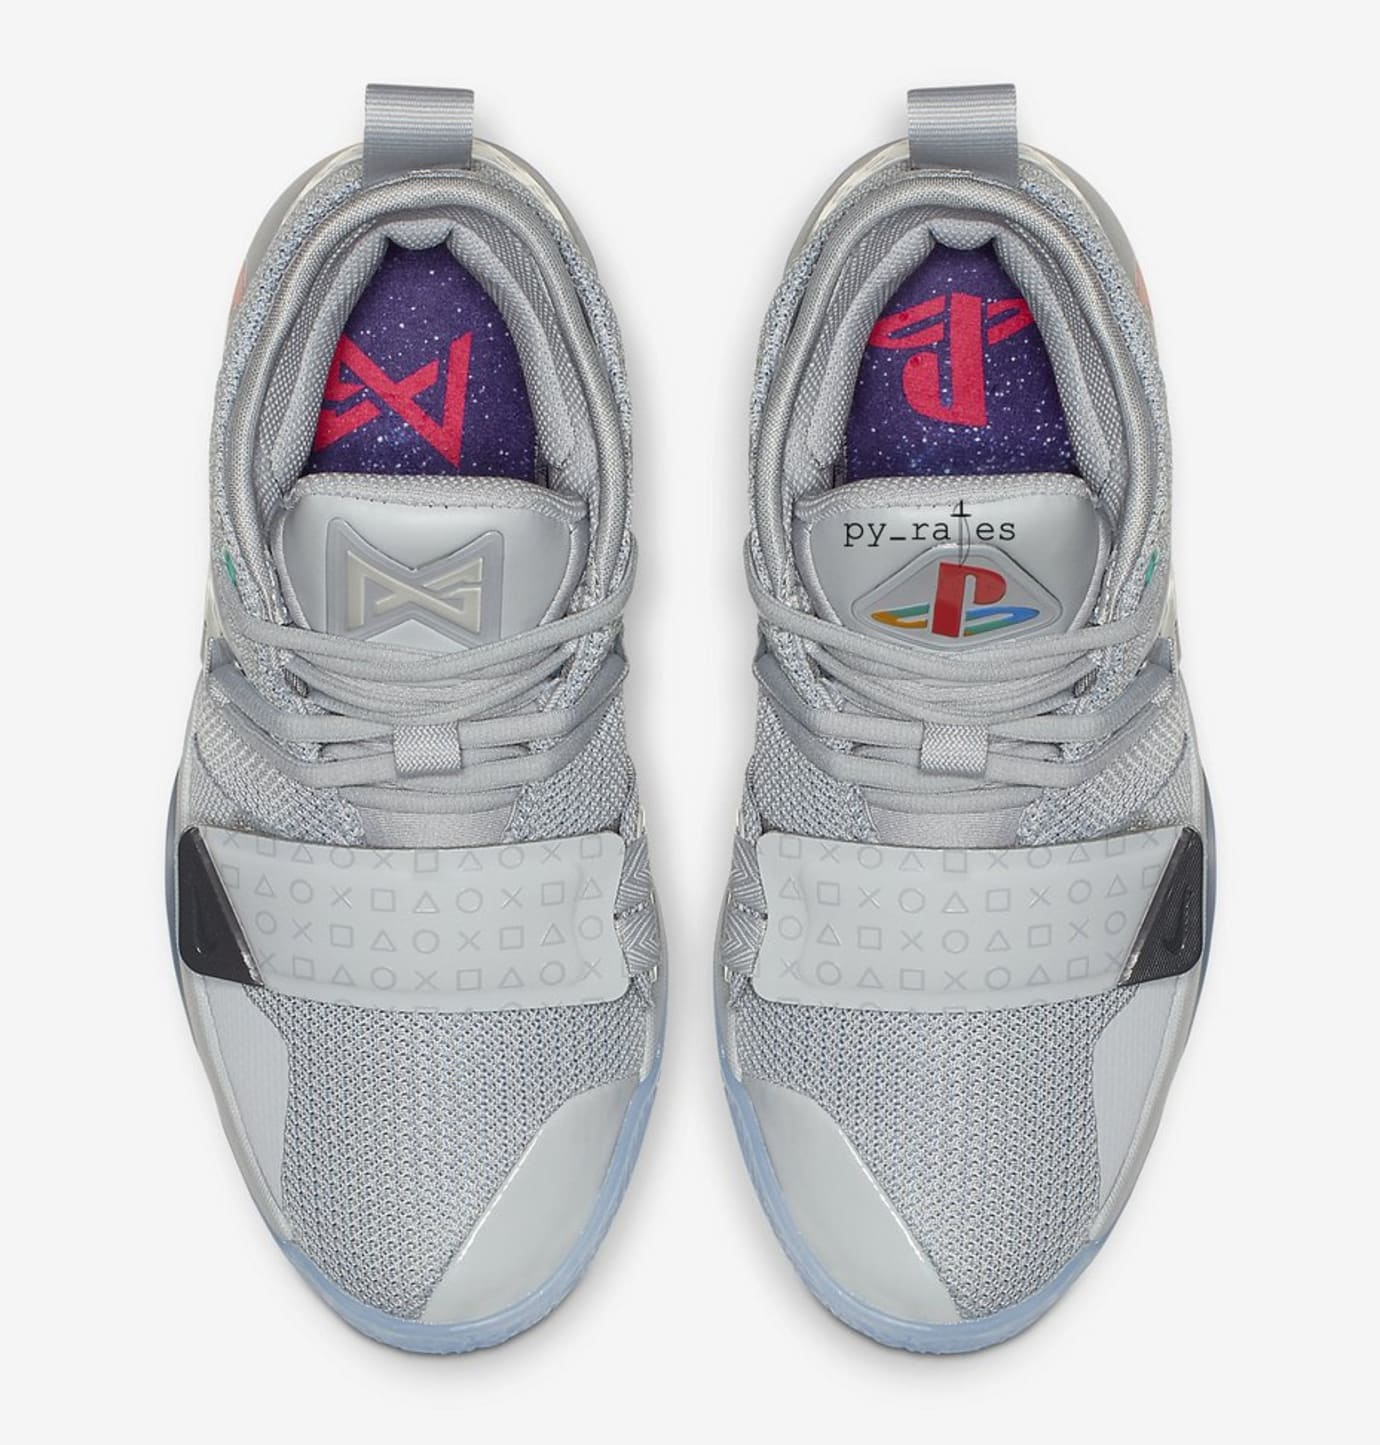 Nike PG 2.5 'Playstation/Grey' (Top)